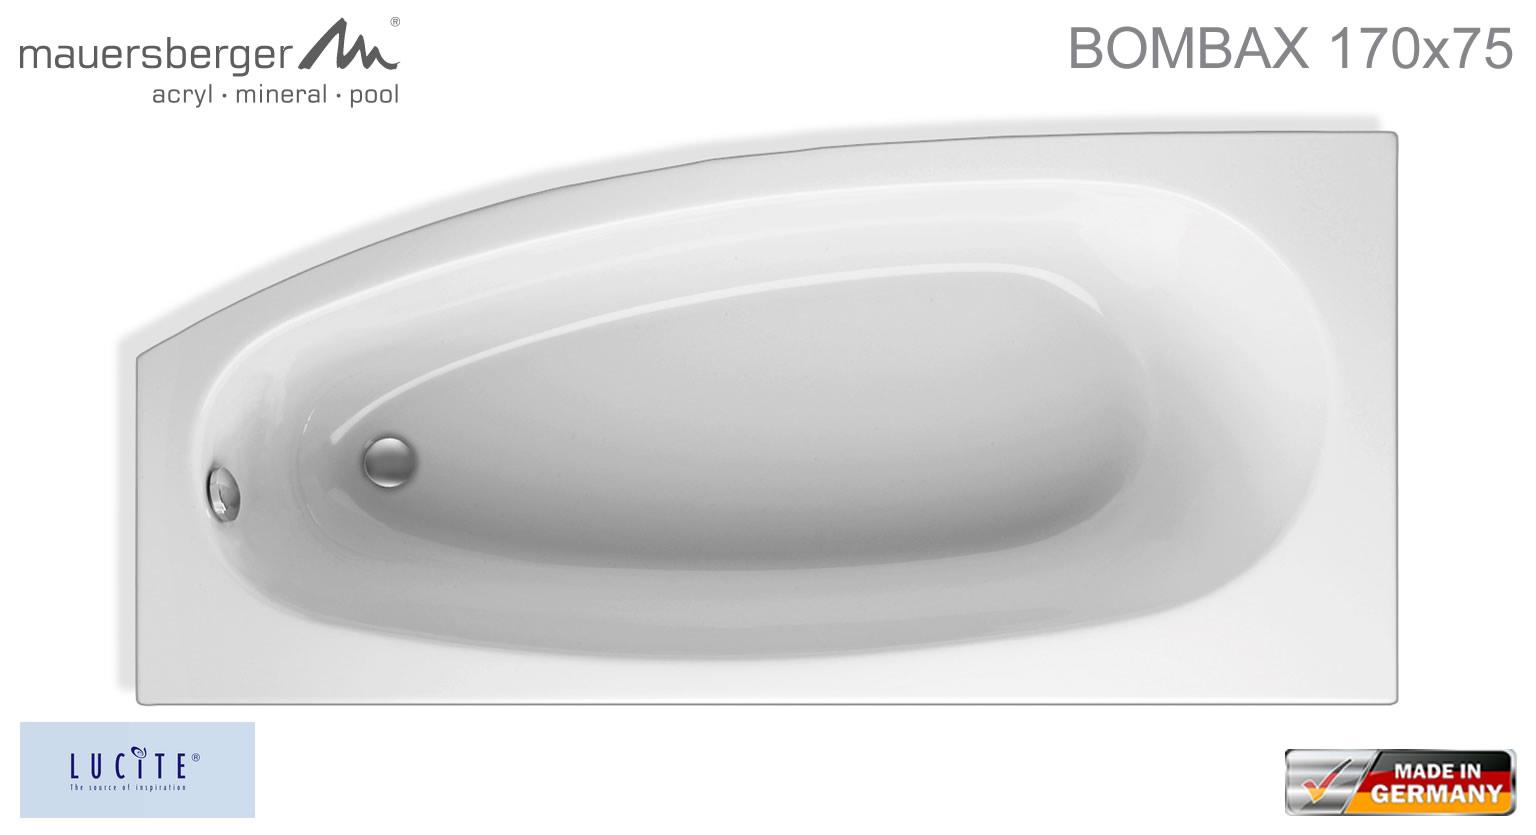 Mauersberger Badewanne Bombax 170 X 75 Cm Acryl Kompakt Wanne